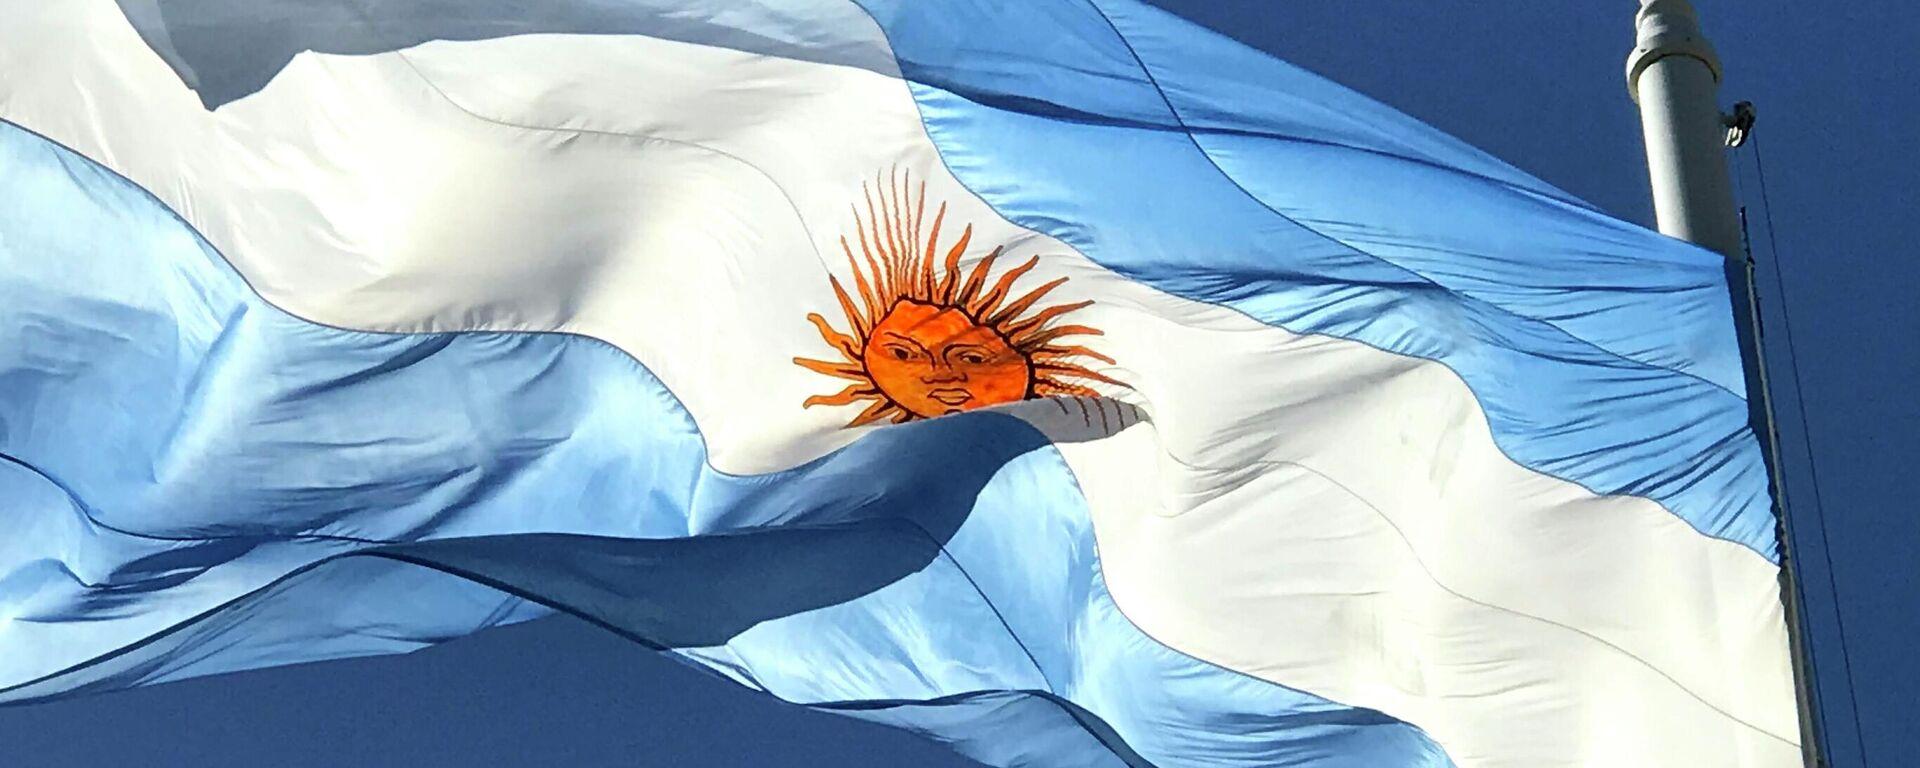 Bandera de Argentina - Sputnik Mundo, 1920, 28.09.2021